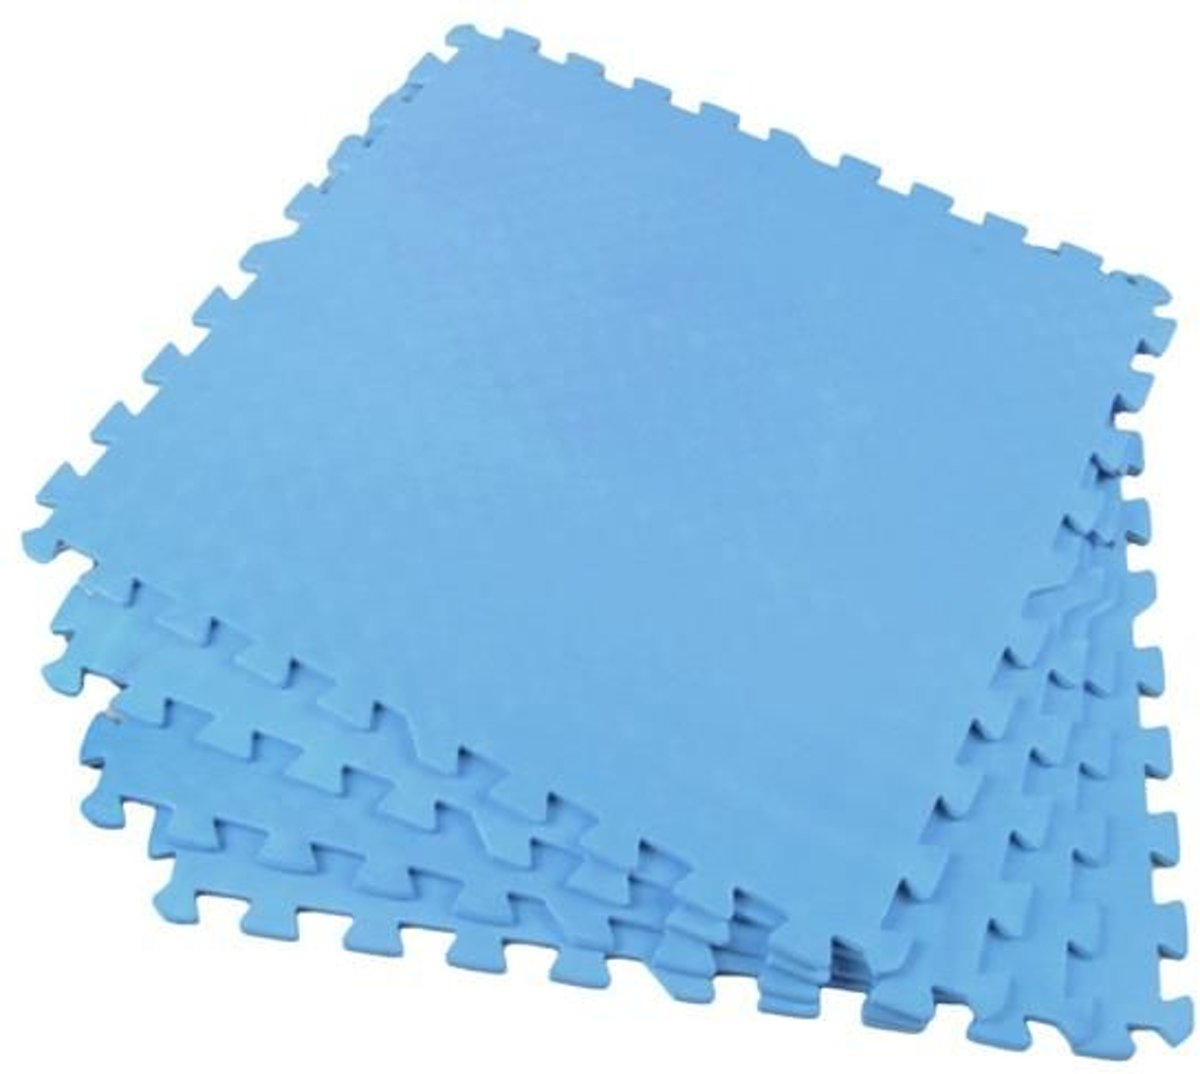 xxl foam speelmat puzzelmat vloerpuzzel eva schuim mat vloertegel speeltapijt vloermat 4. Black Bedroom Furniture Sets. Home Design Ideas